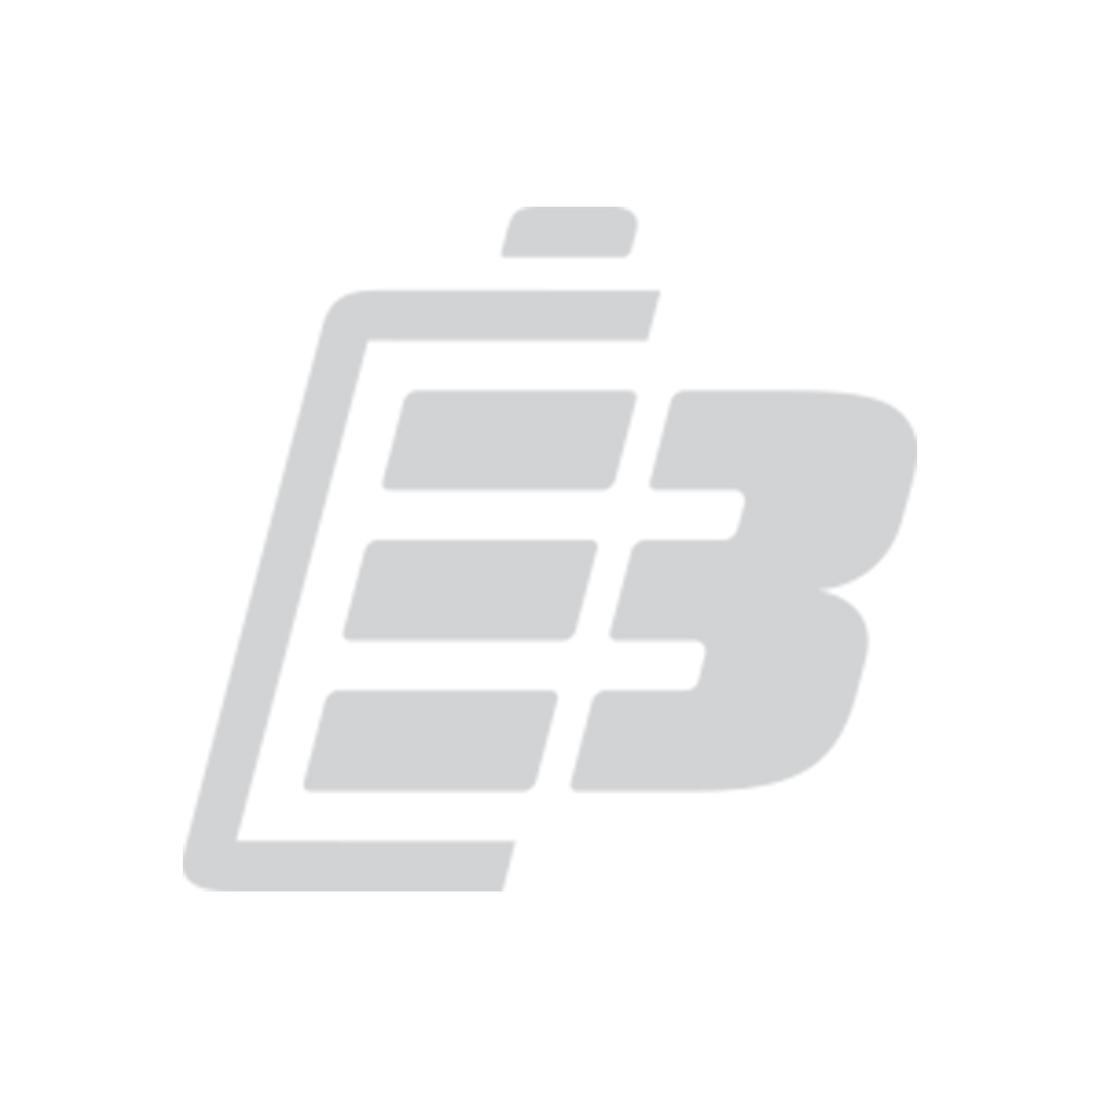 Fenix LD15R LED Flashlight 1